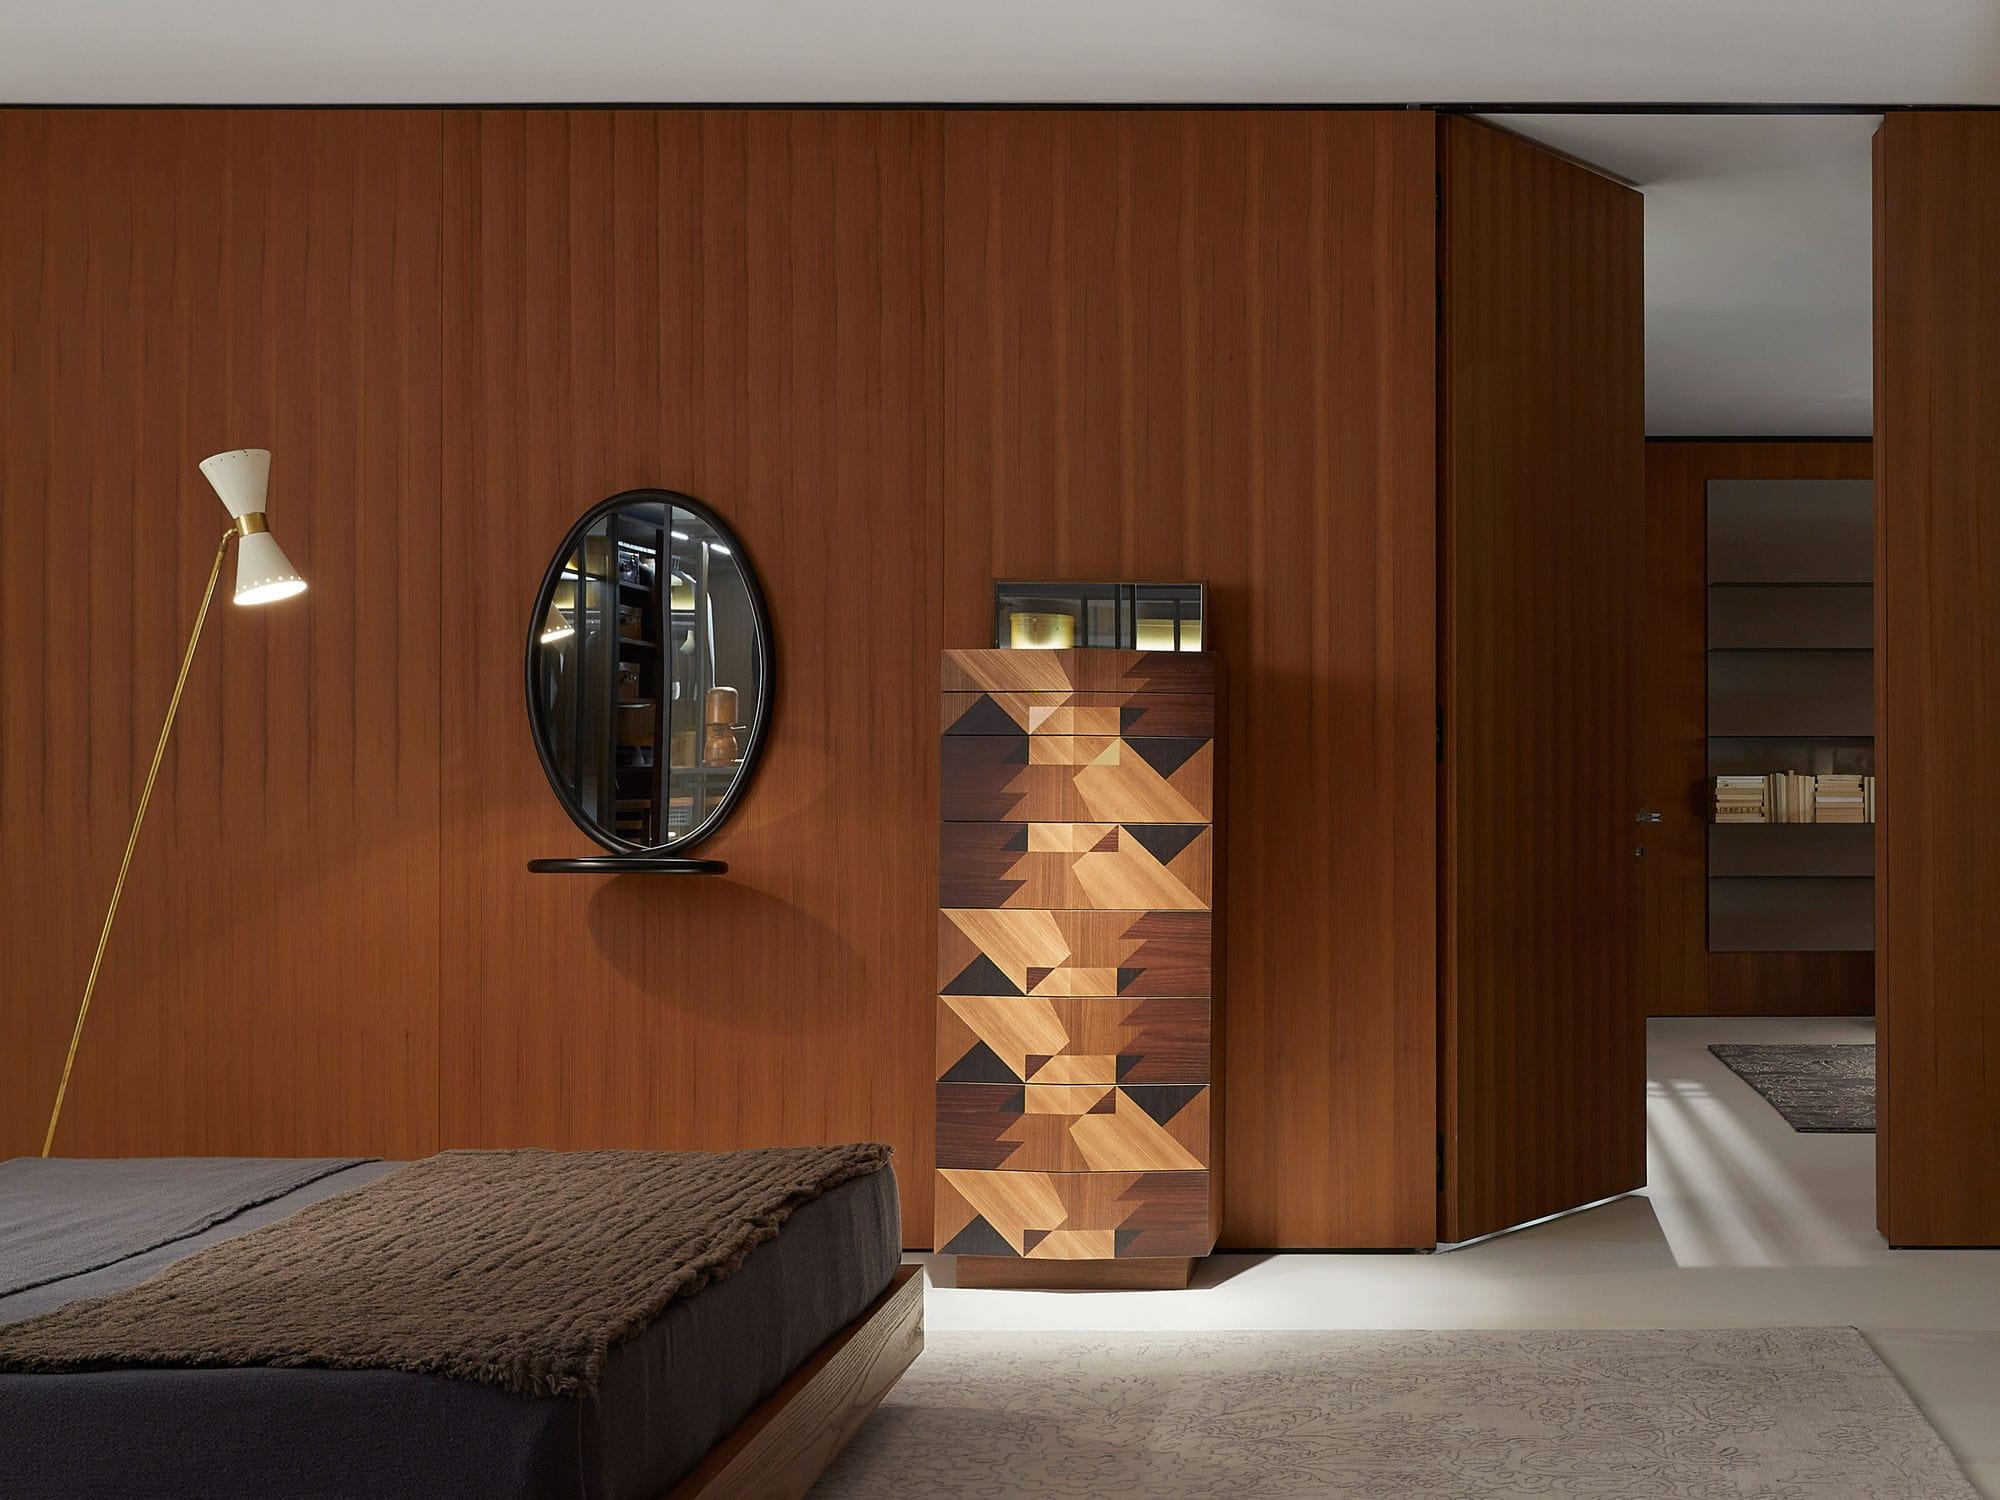 Miroir mural contemporain ovale en bois massif LOOP by